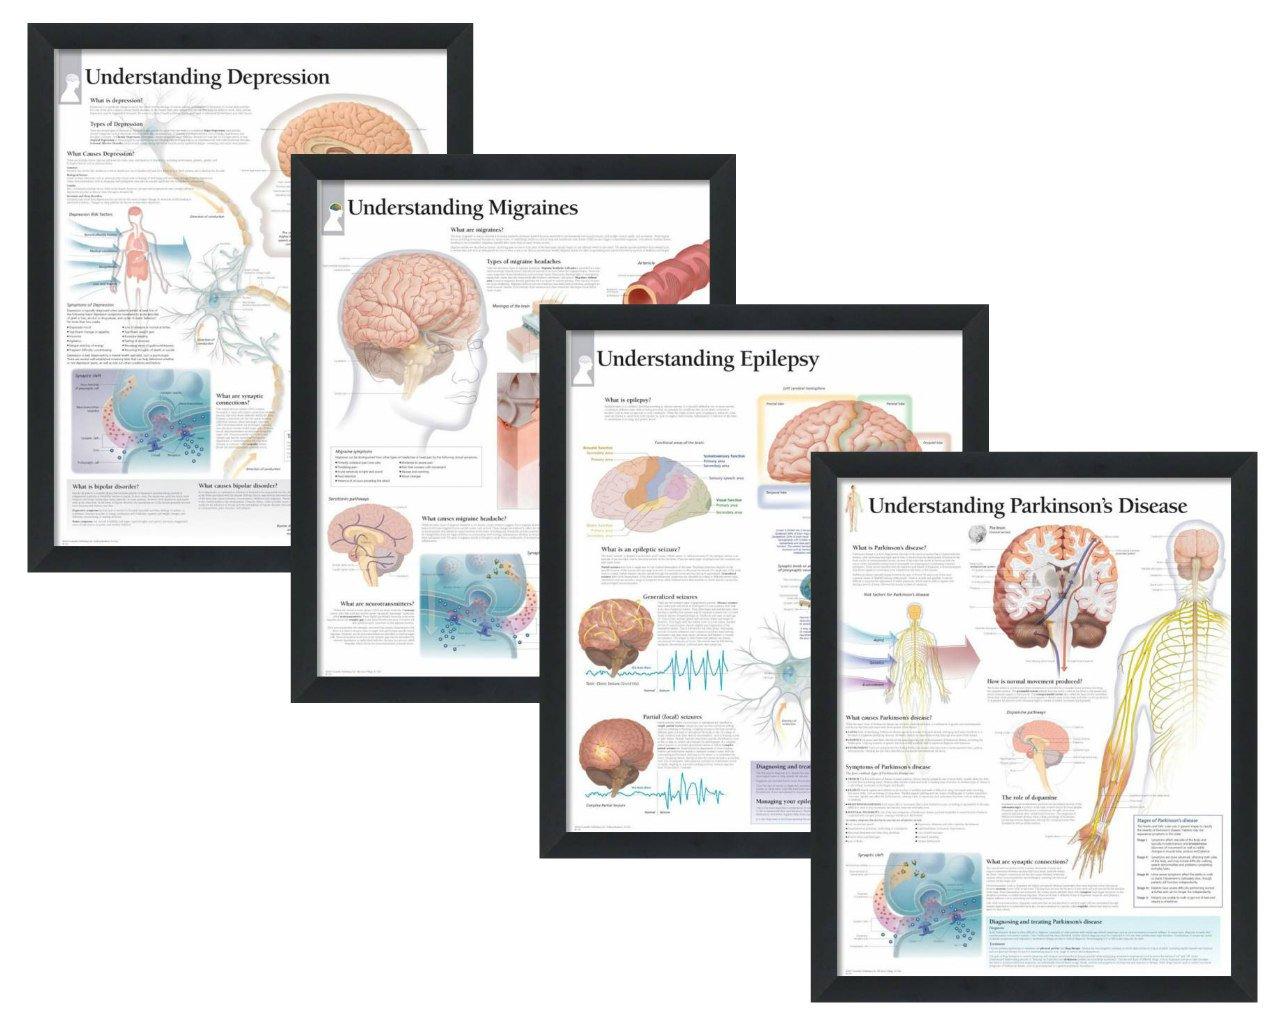 "Set of 4 Framed Medical Posters Understanding Depression, Understanding Migraines, Understanding Epilepsy, and Understanding Parkinson's Disease 22""x28"" Wall Diagrams"